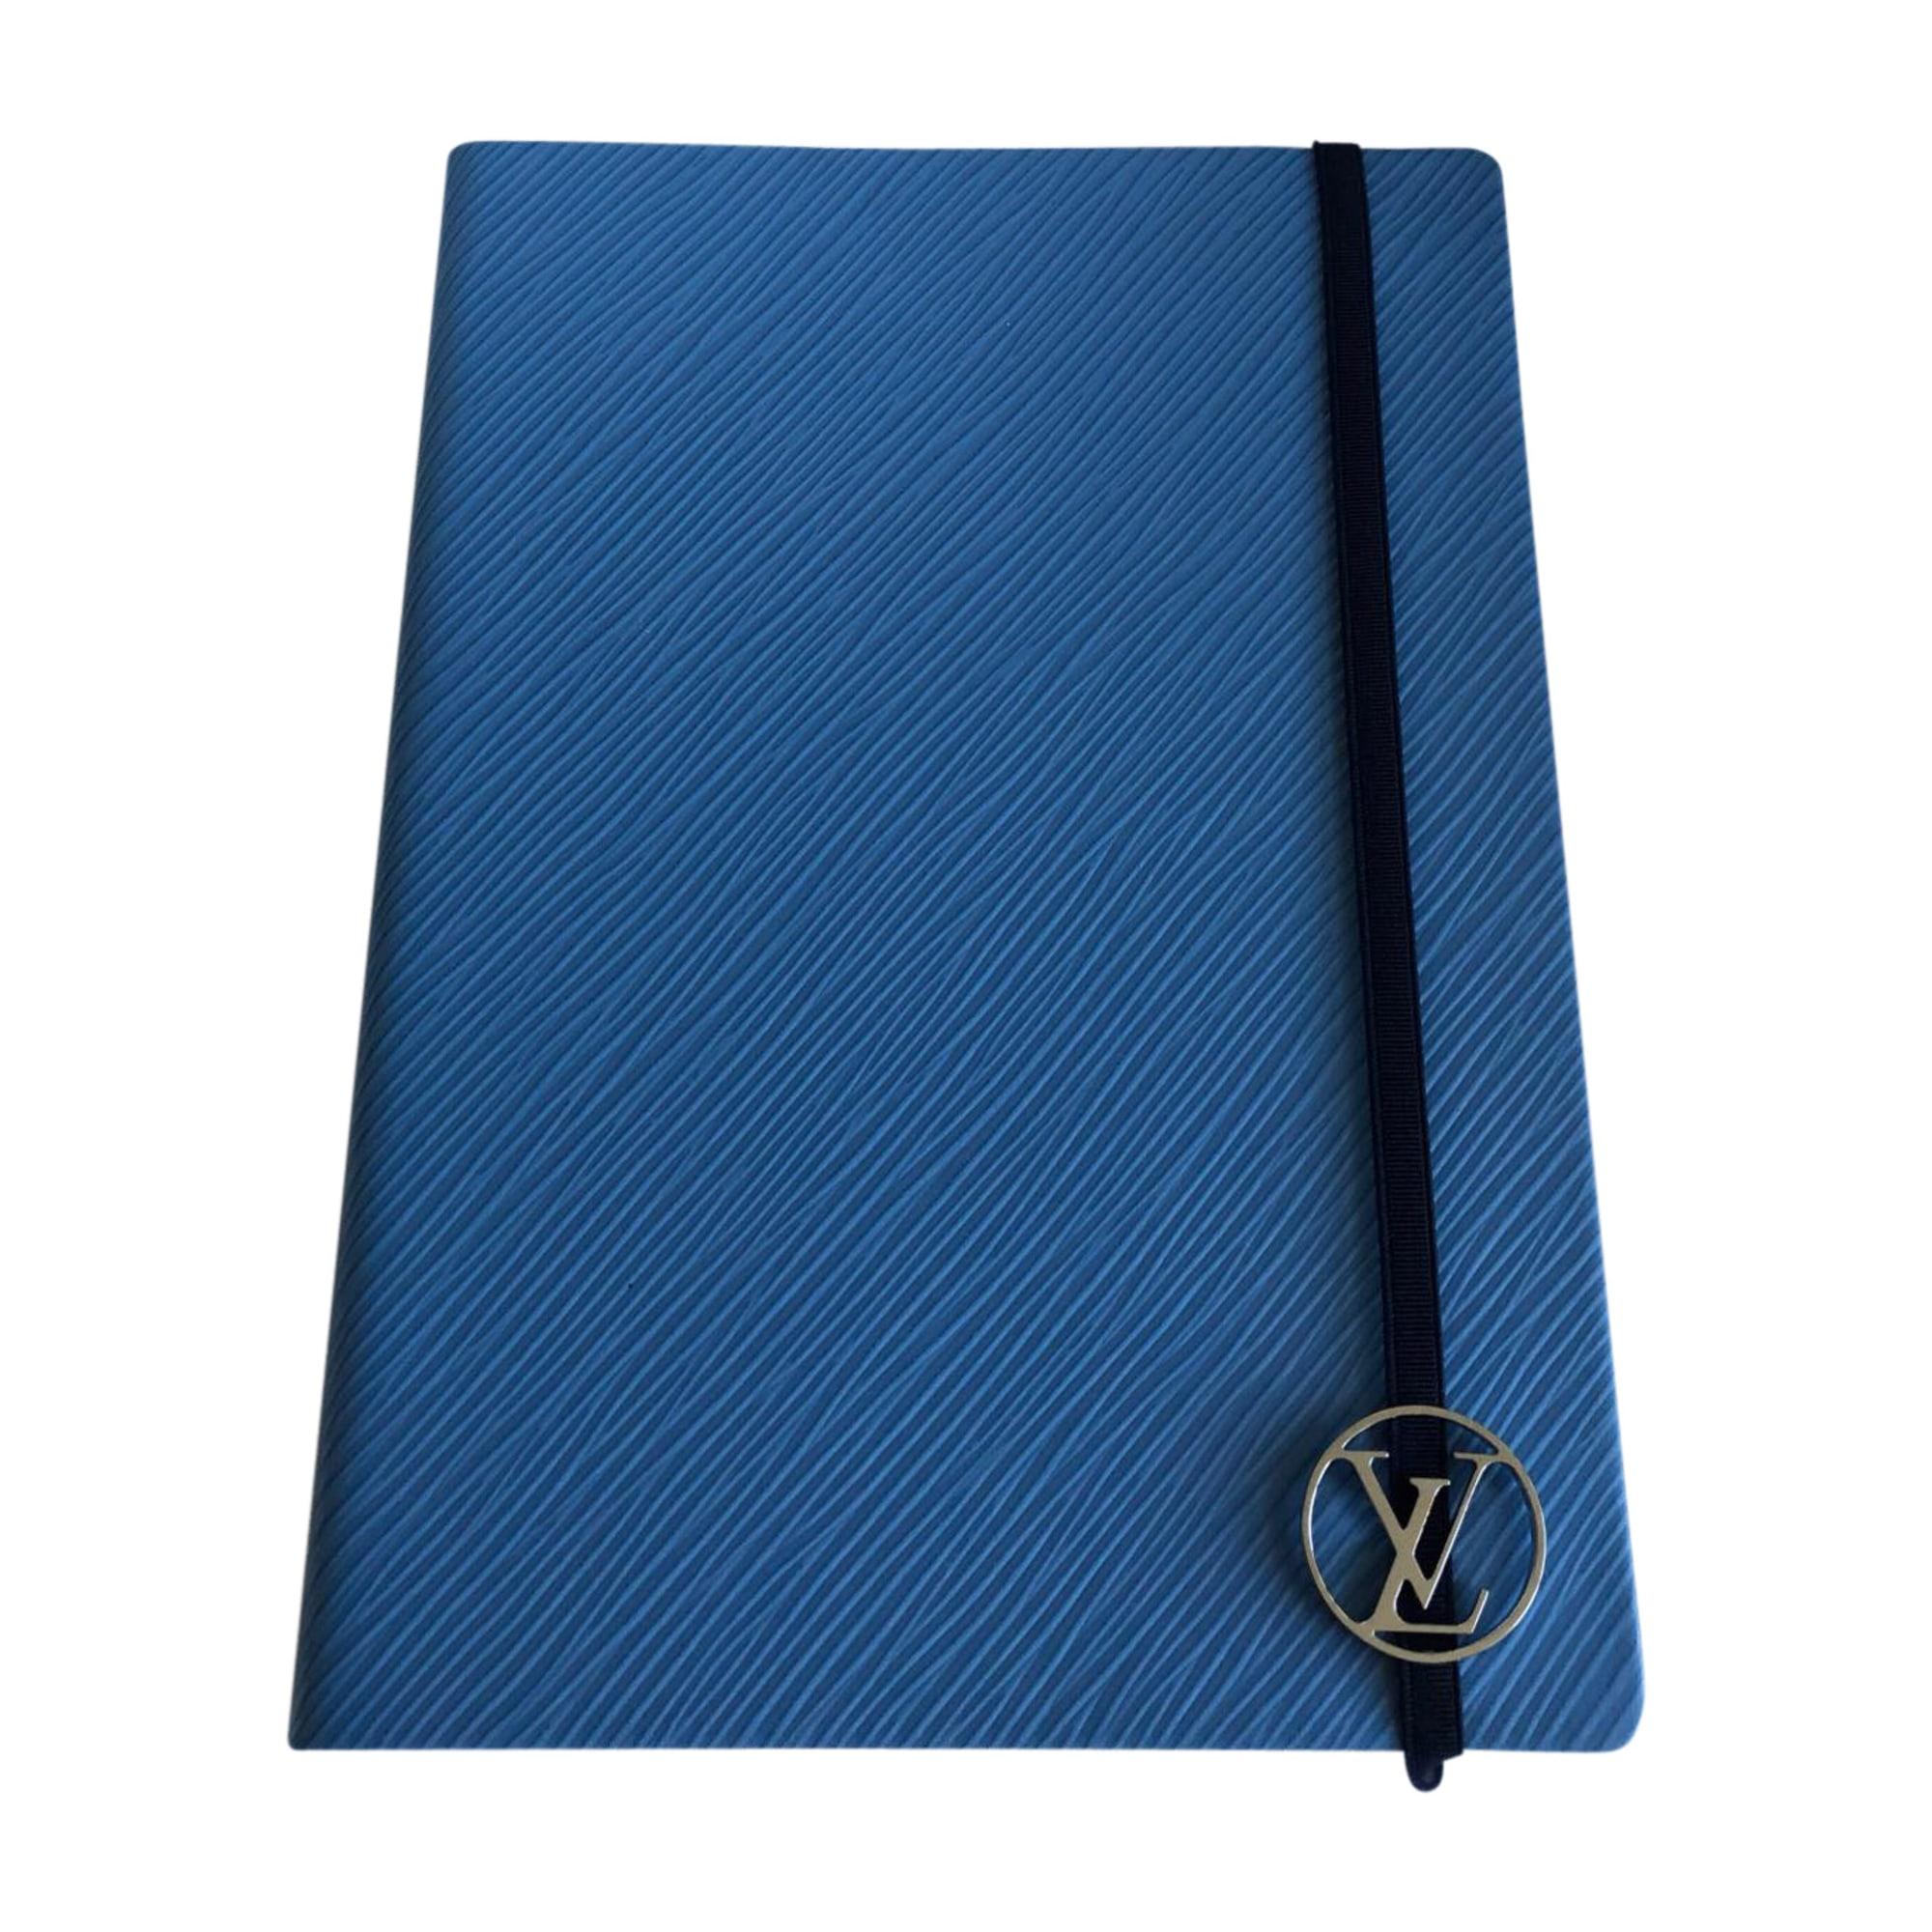 Porte documents, serviette LOUIS VUITTON Bleu, bleu marine, bleu turquoise